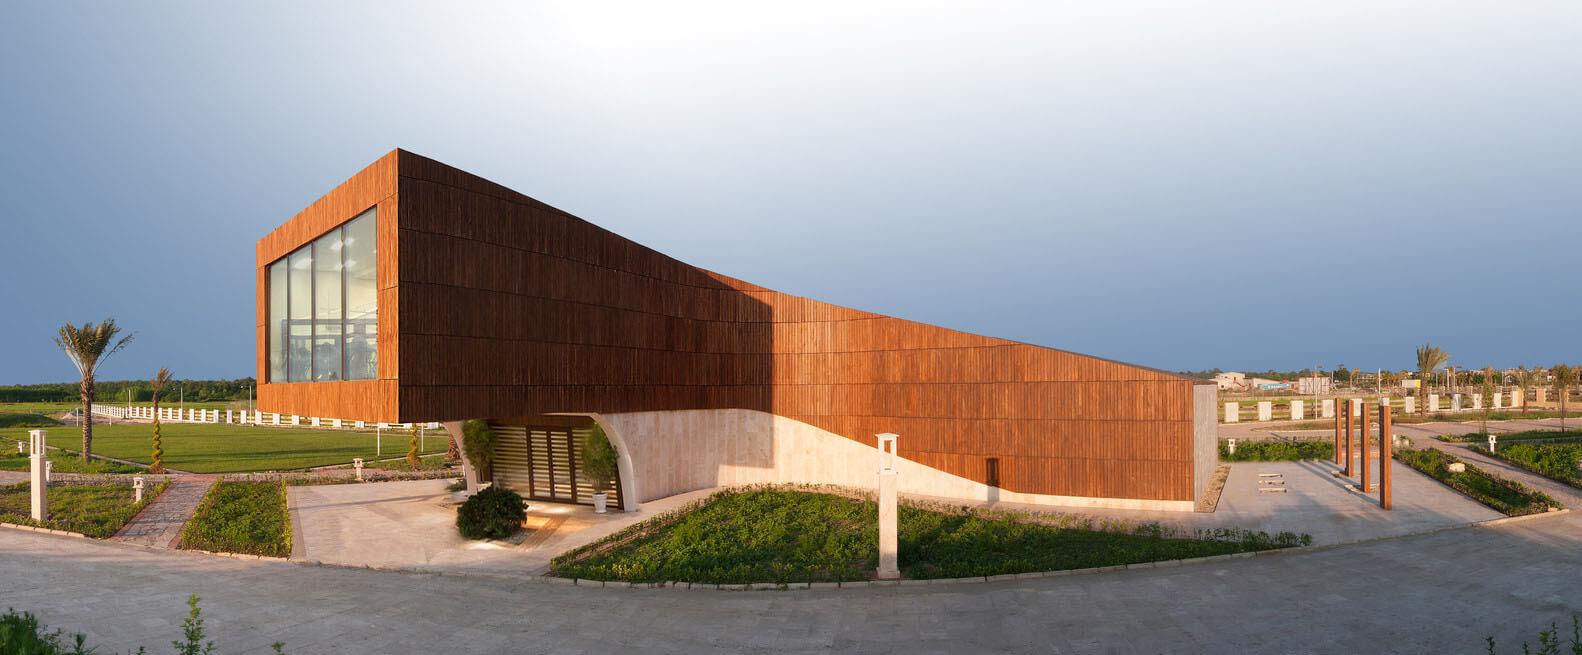 Image result for Dashte Noor Gym (Mazandaran, Iran)